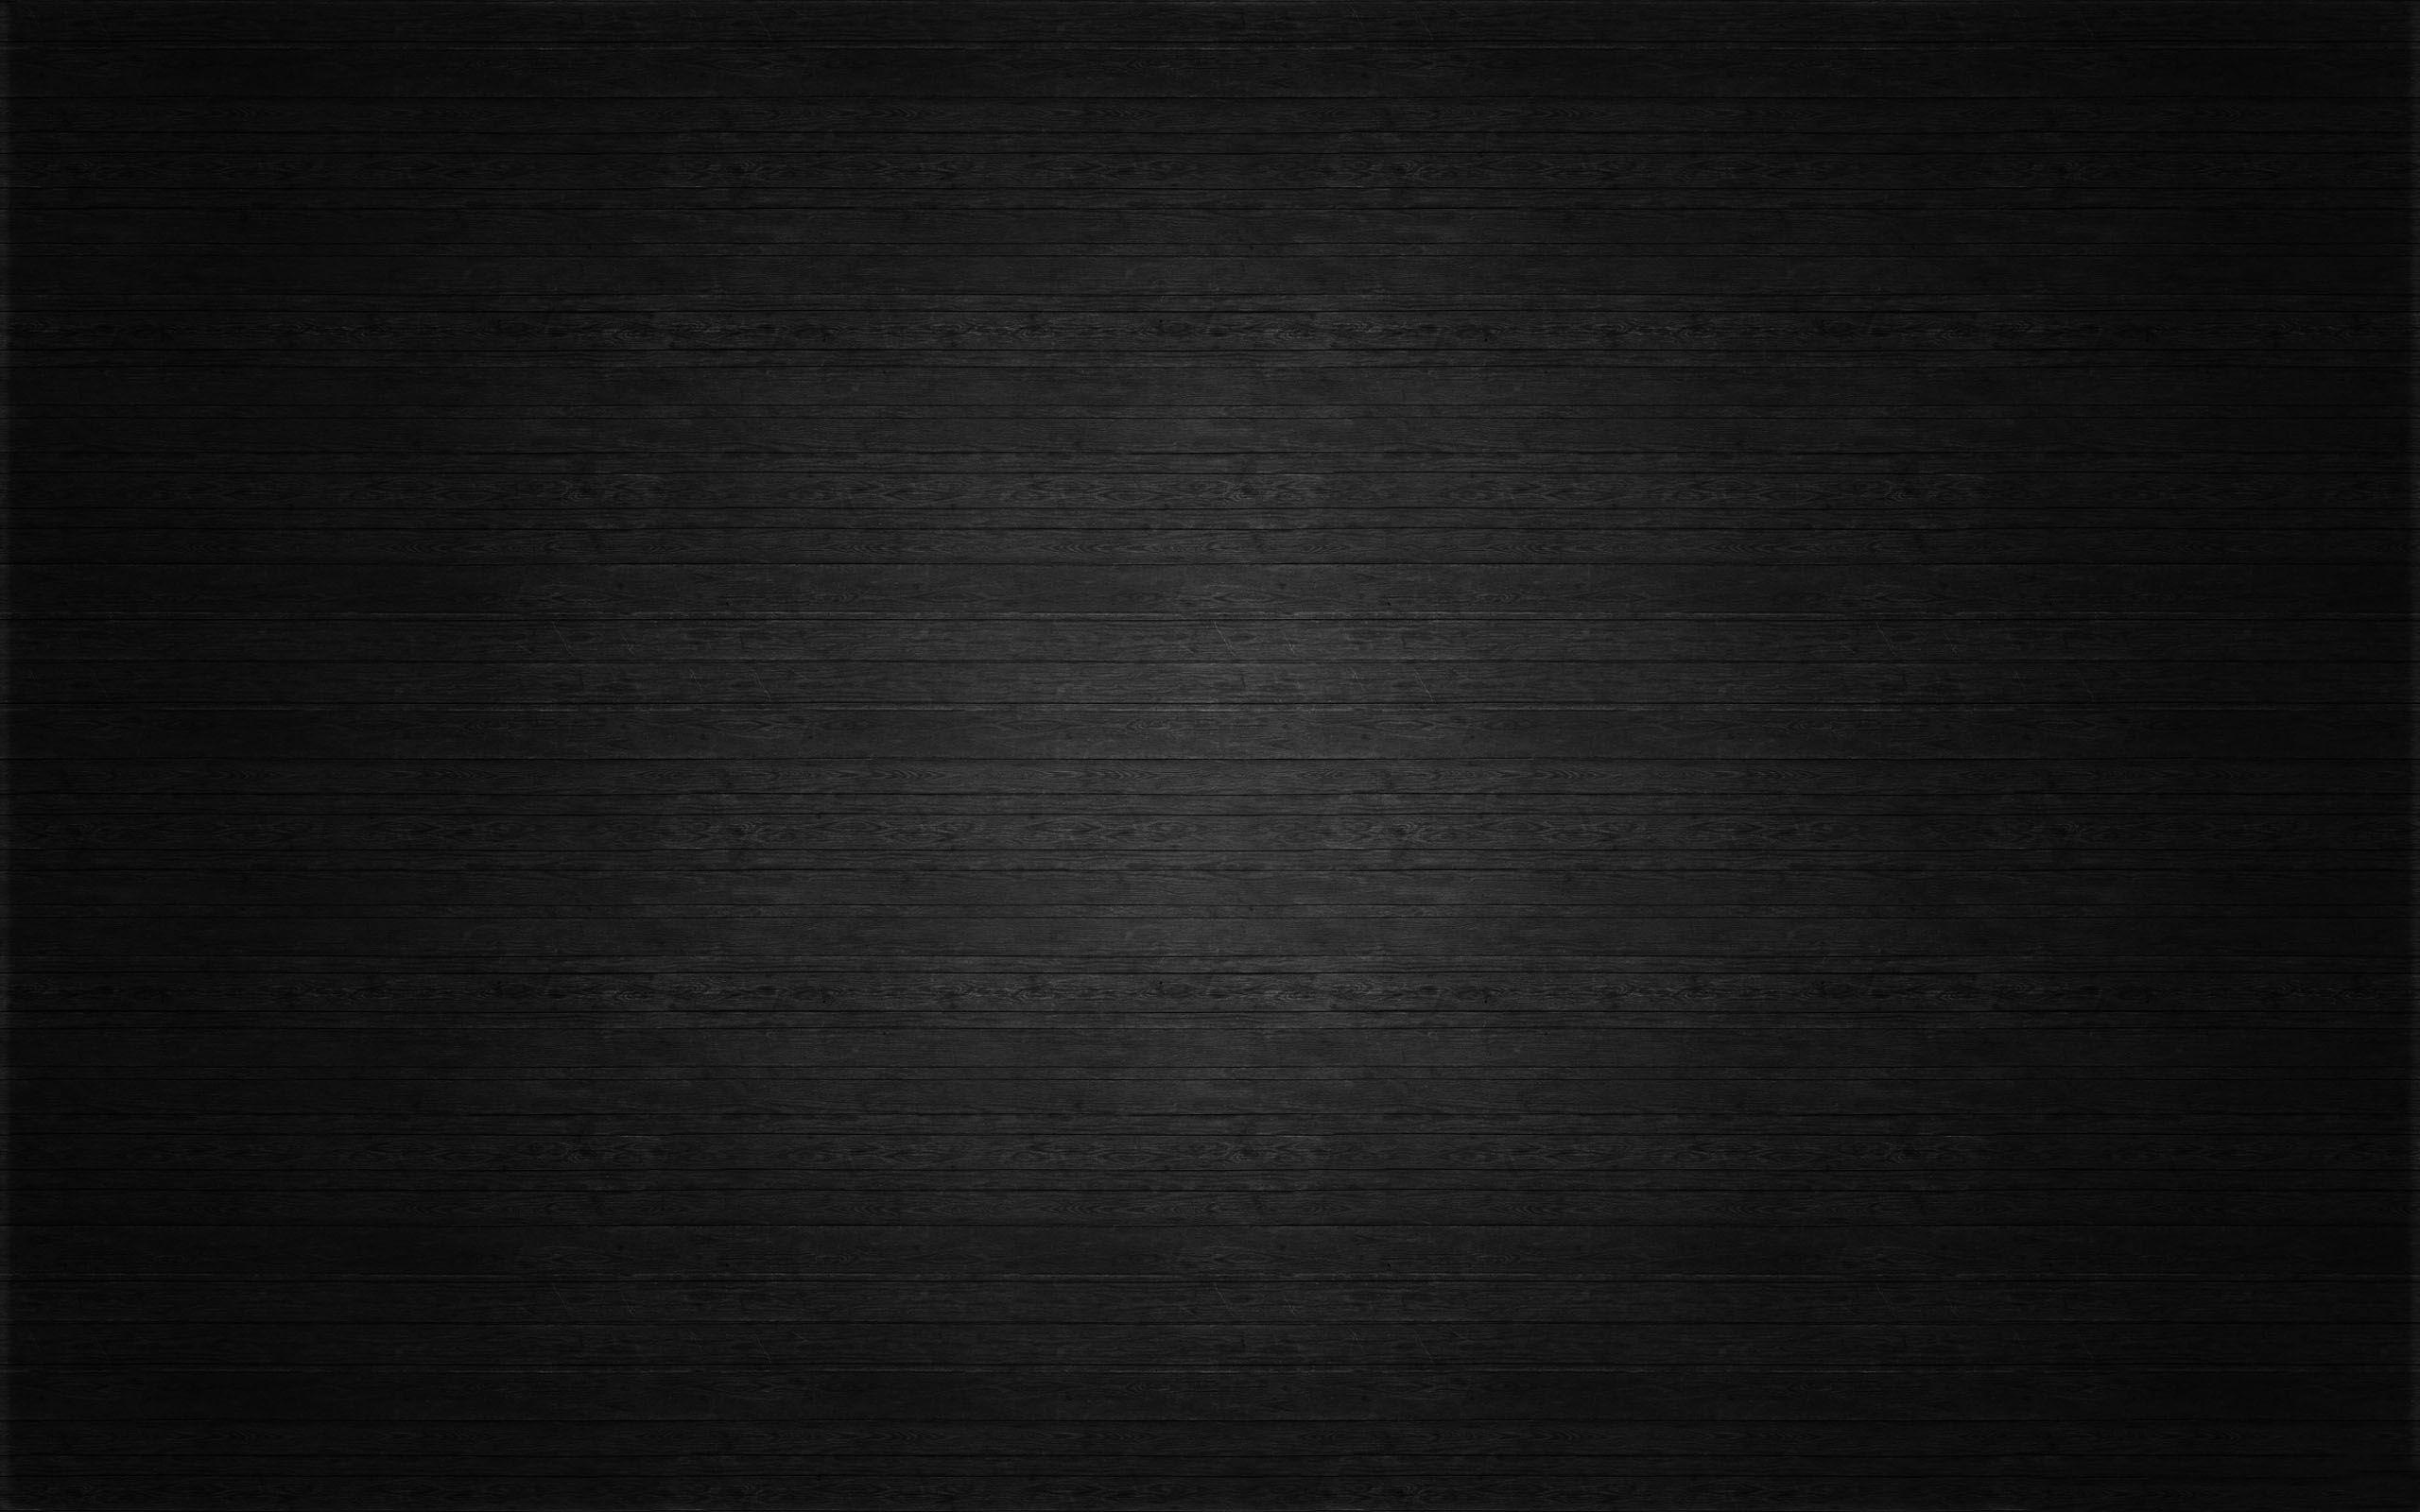 Black Full Hd Wallpaper Page 1